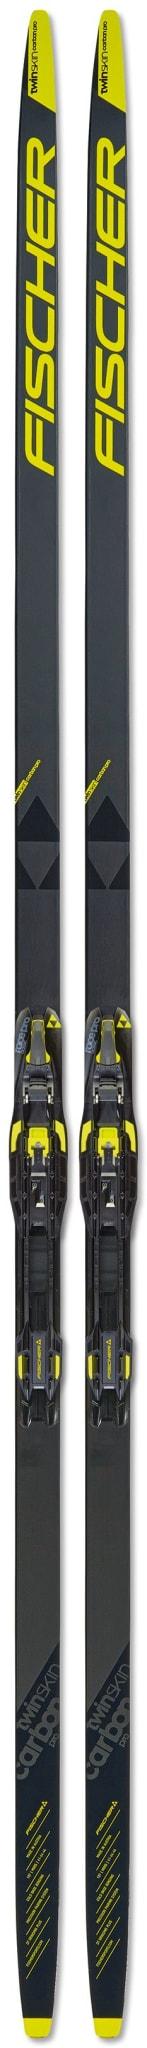 Twin Skin Carbon Pro